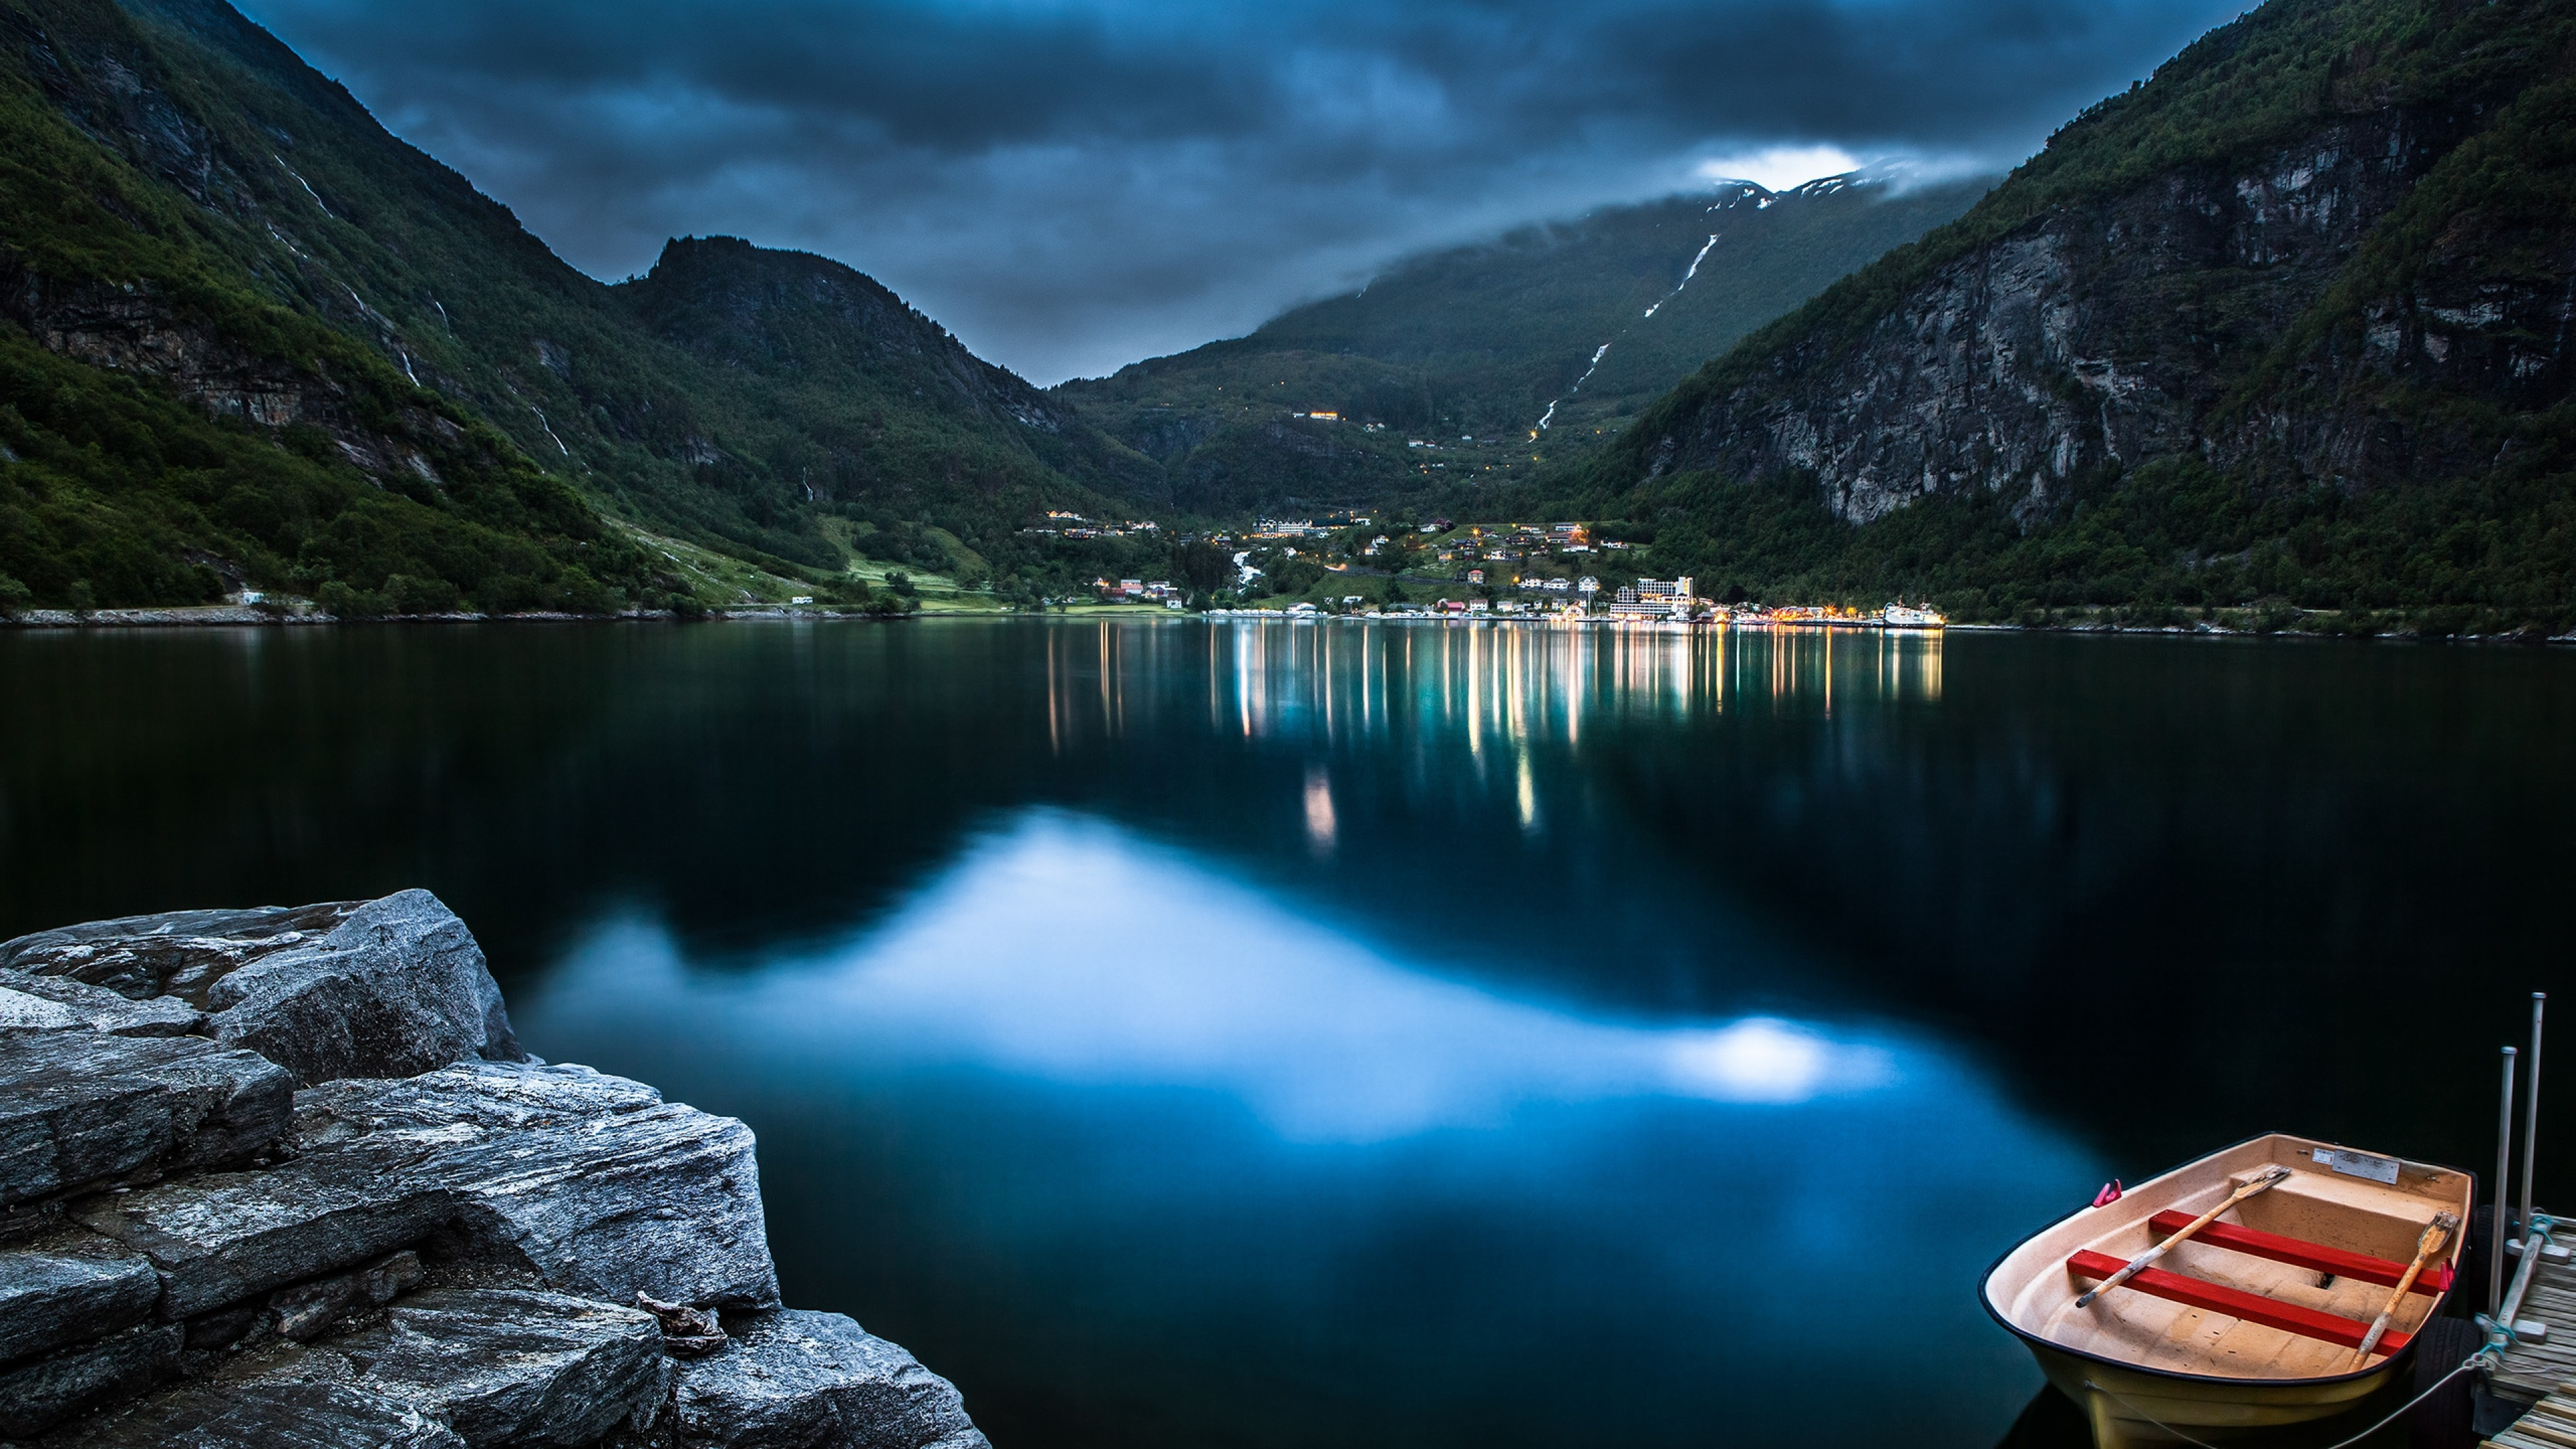 mountain lake beautiful night 1535923995 - Mountain Lake Beautiful Night - nature wallpapers, mountain wallpapers, lake wallpapers, beautiful wallpapers